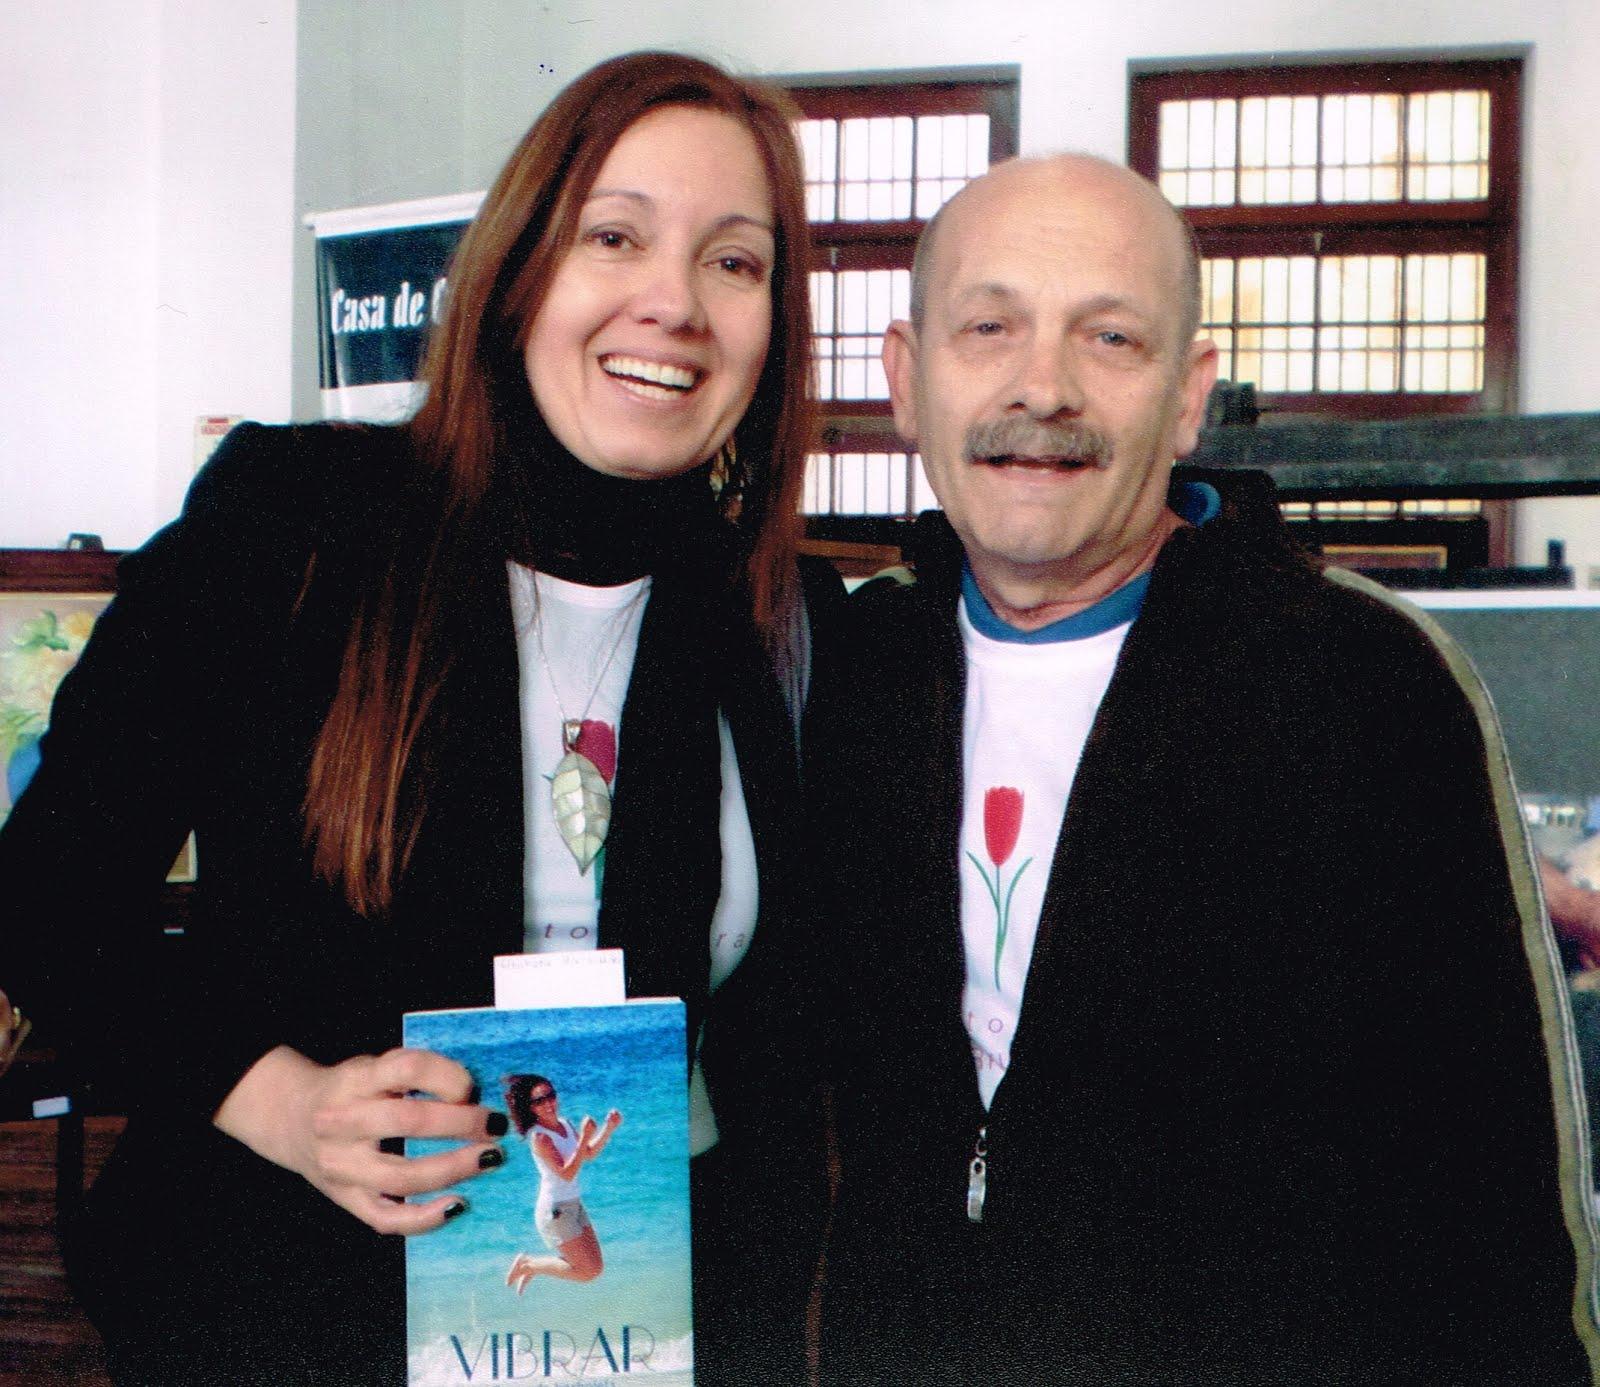 Manoel Ianzer com Eleonora Alcalde Machado